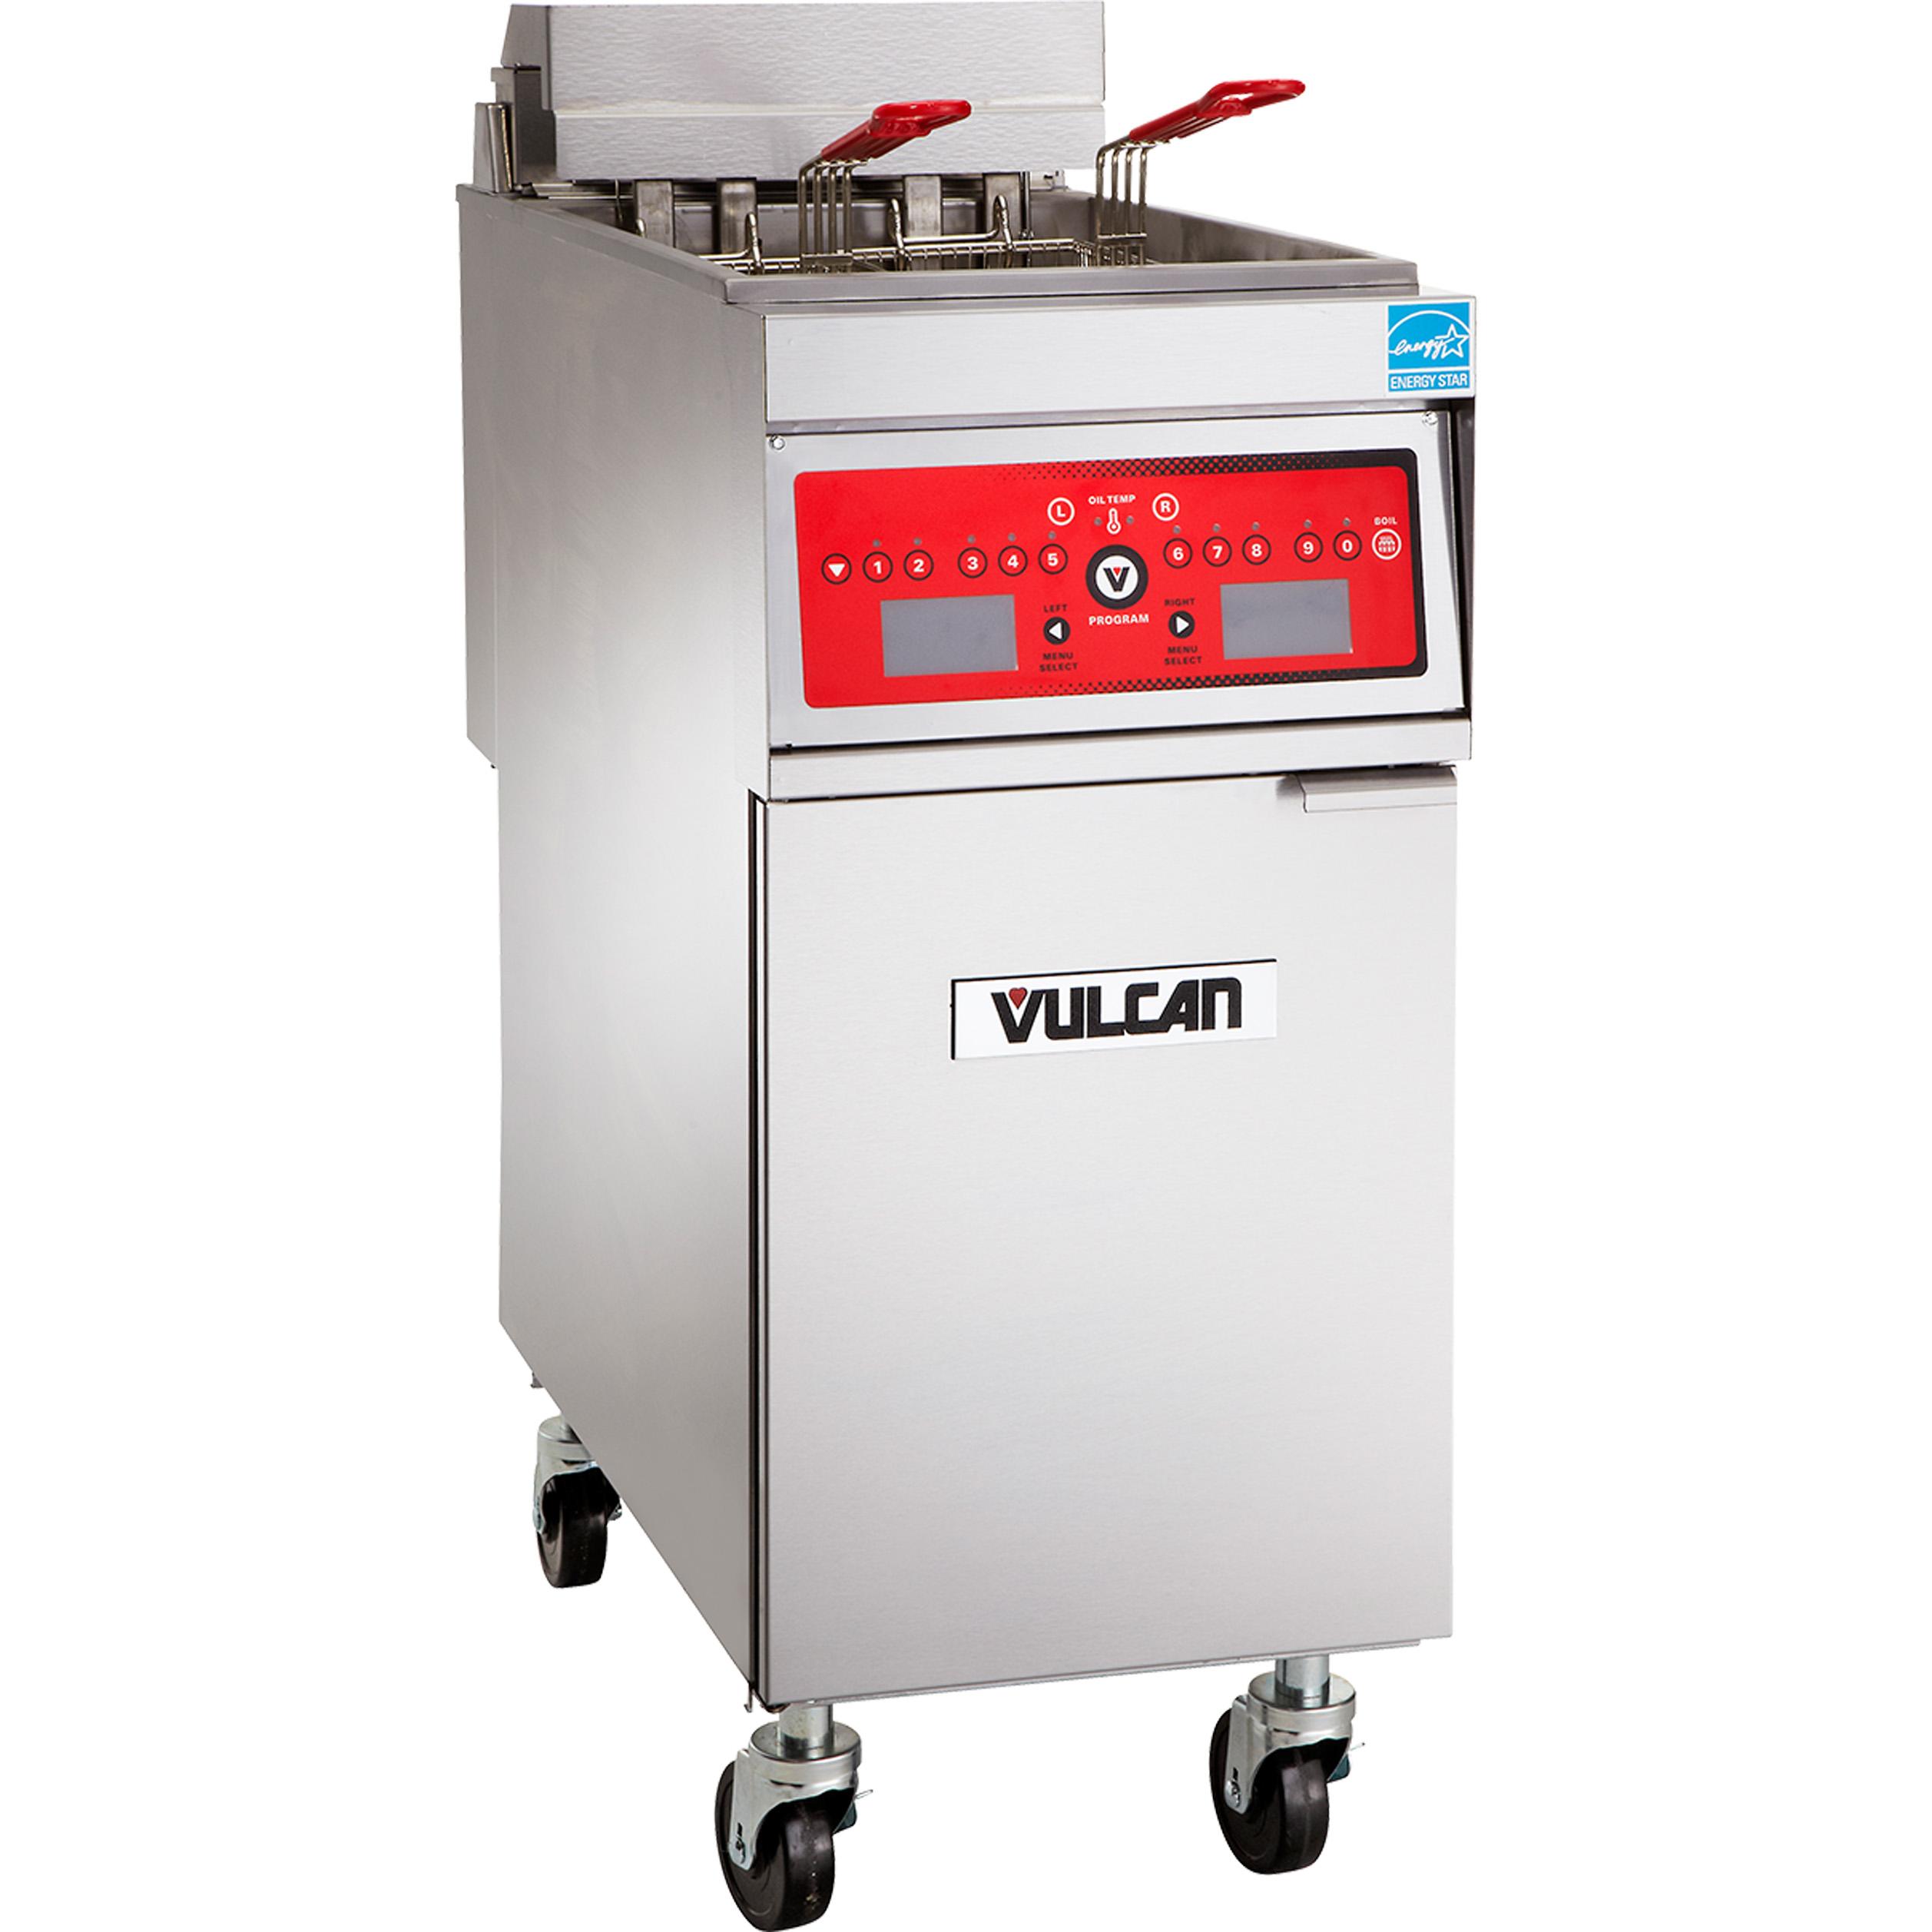 Vulcan 1ER85C fryer, electric, floor model, full pot